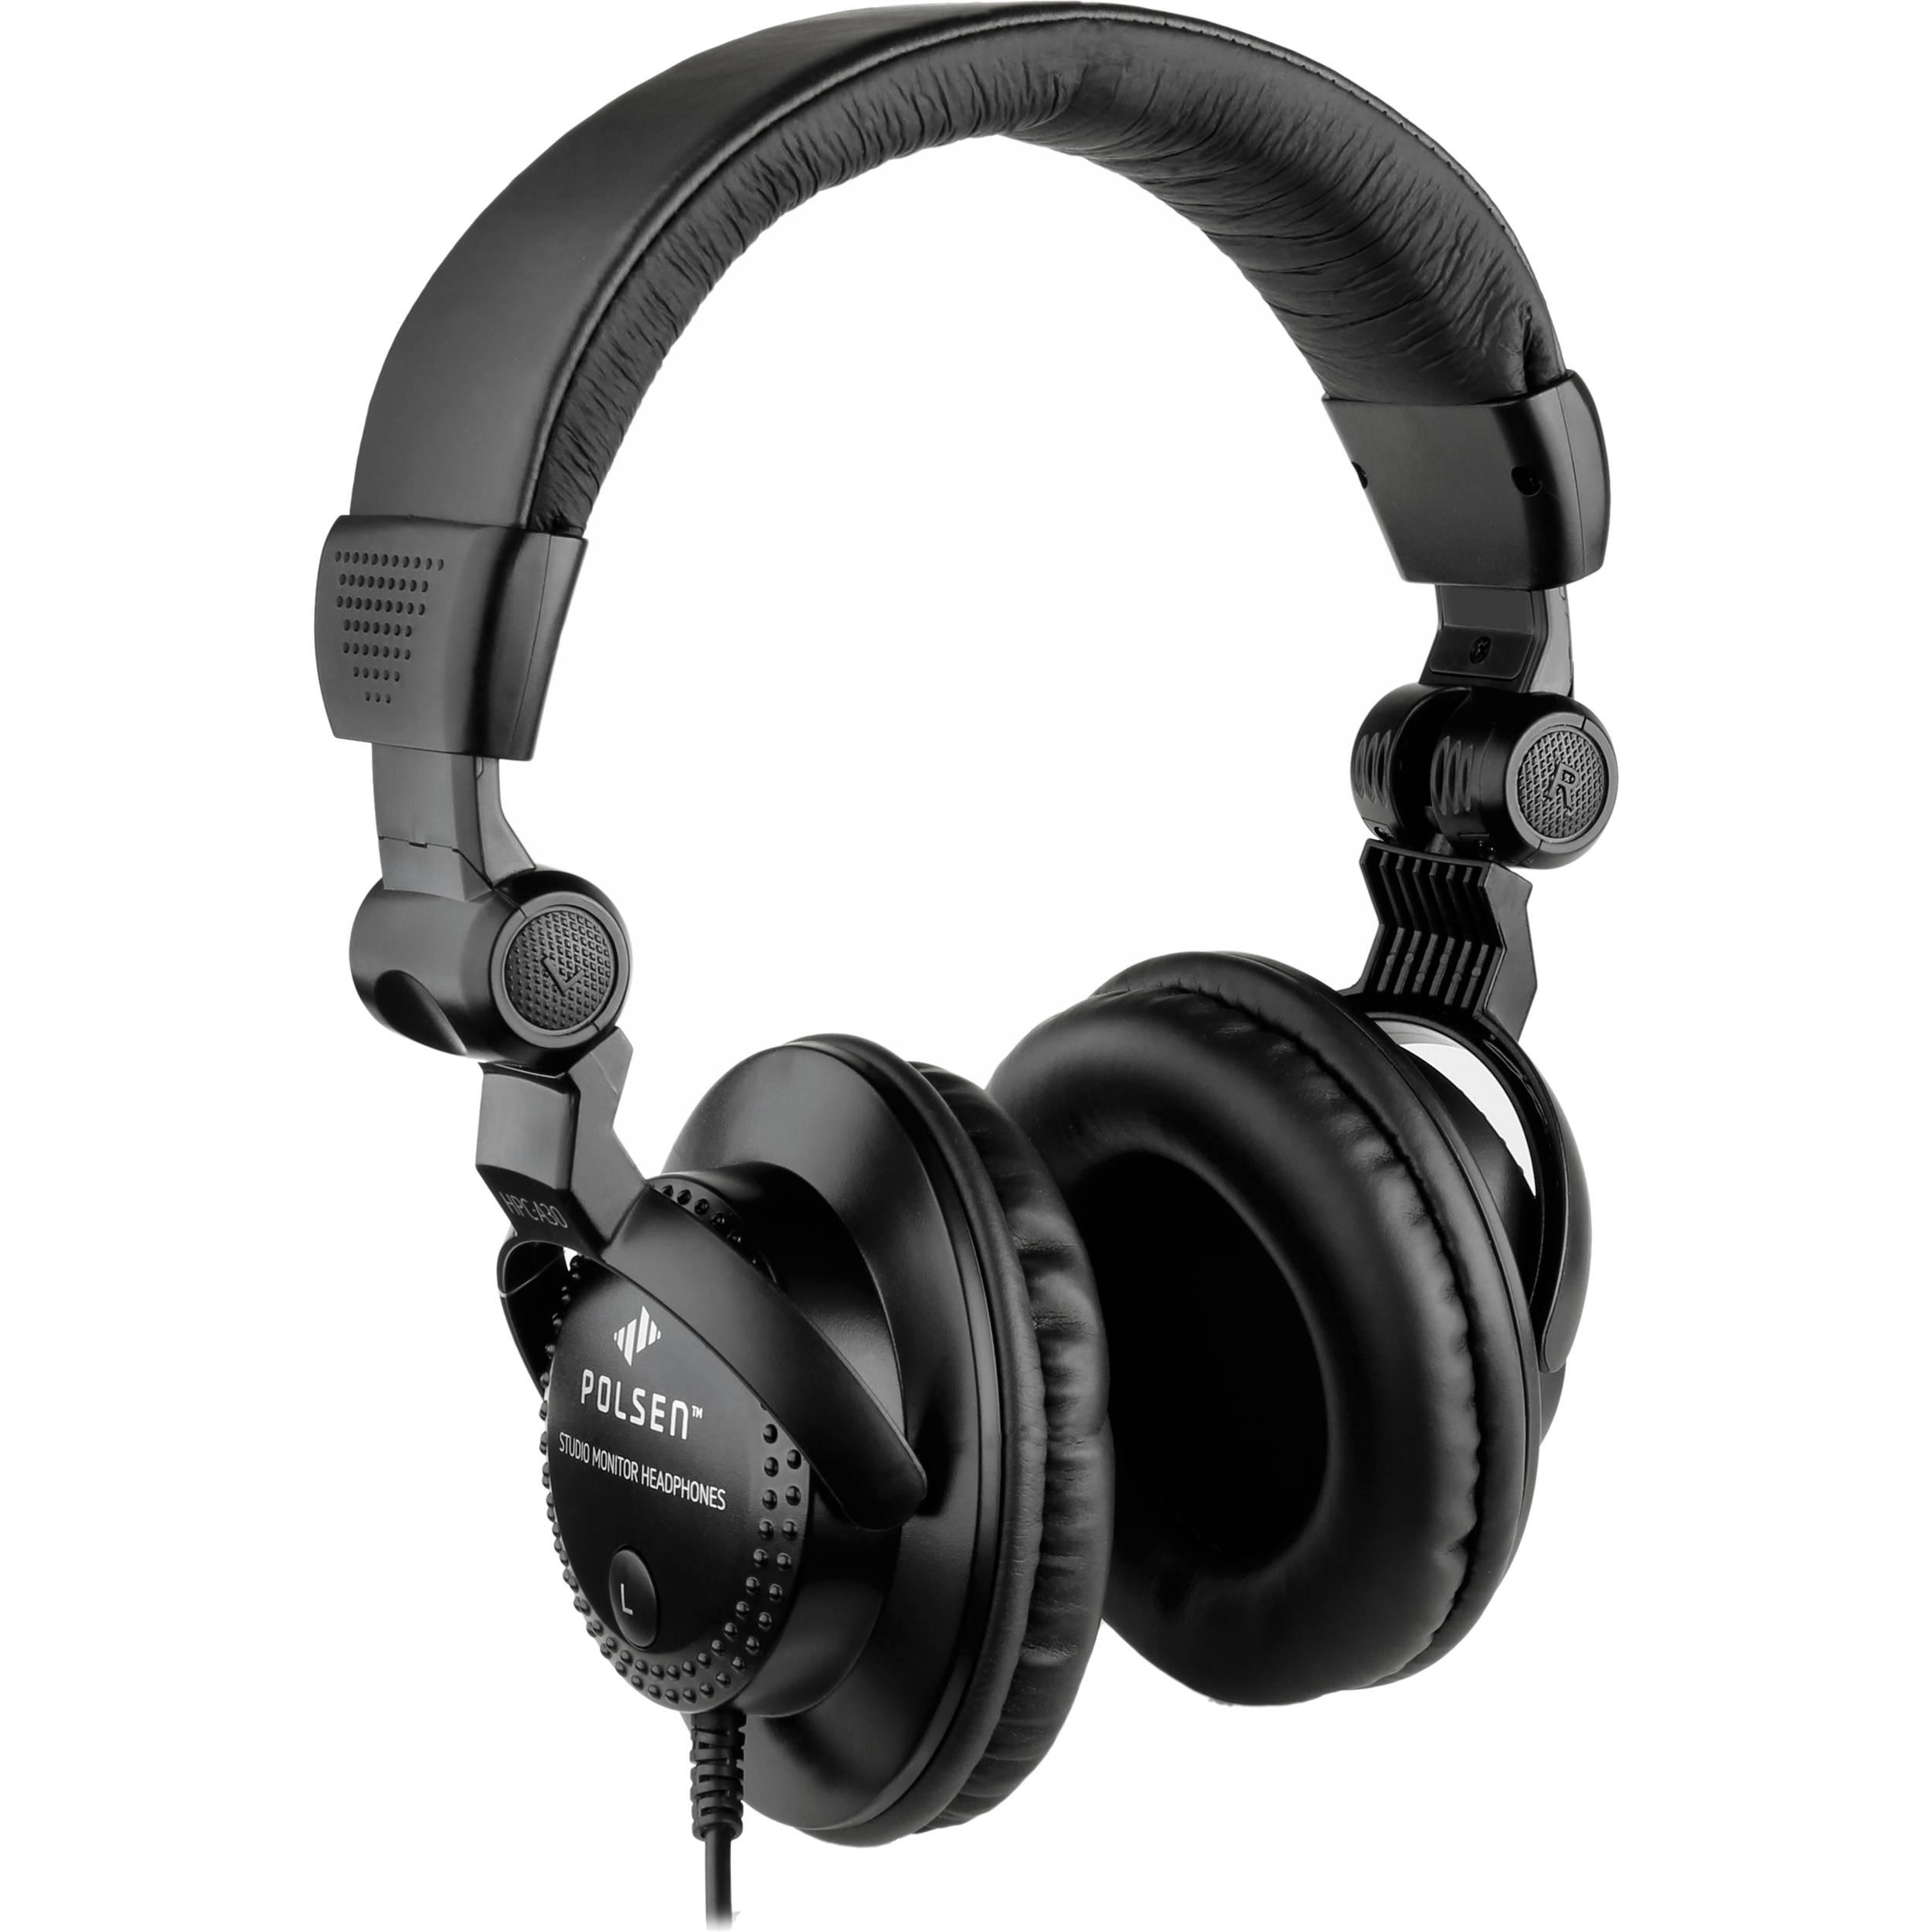 polsen hpc a30 closed back studio monitor headphones hpc a30 b h. Black Bedroom Furniture Sets. Home Design Ideas